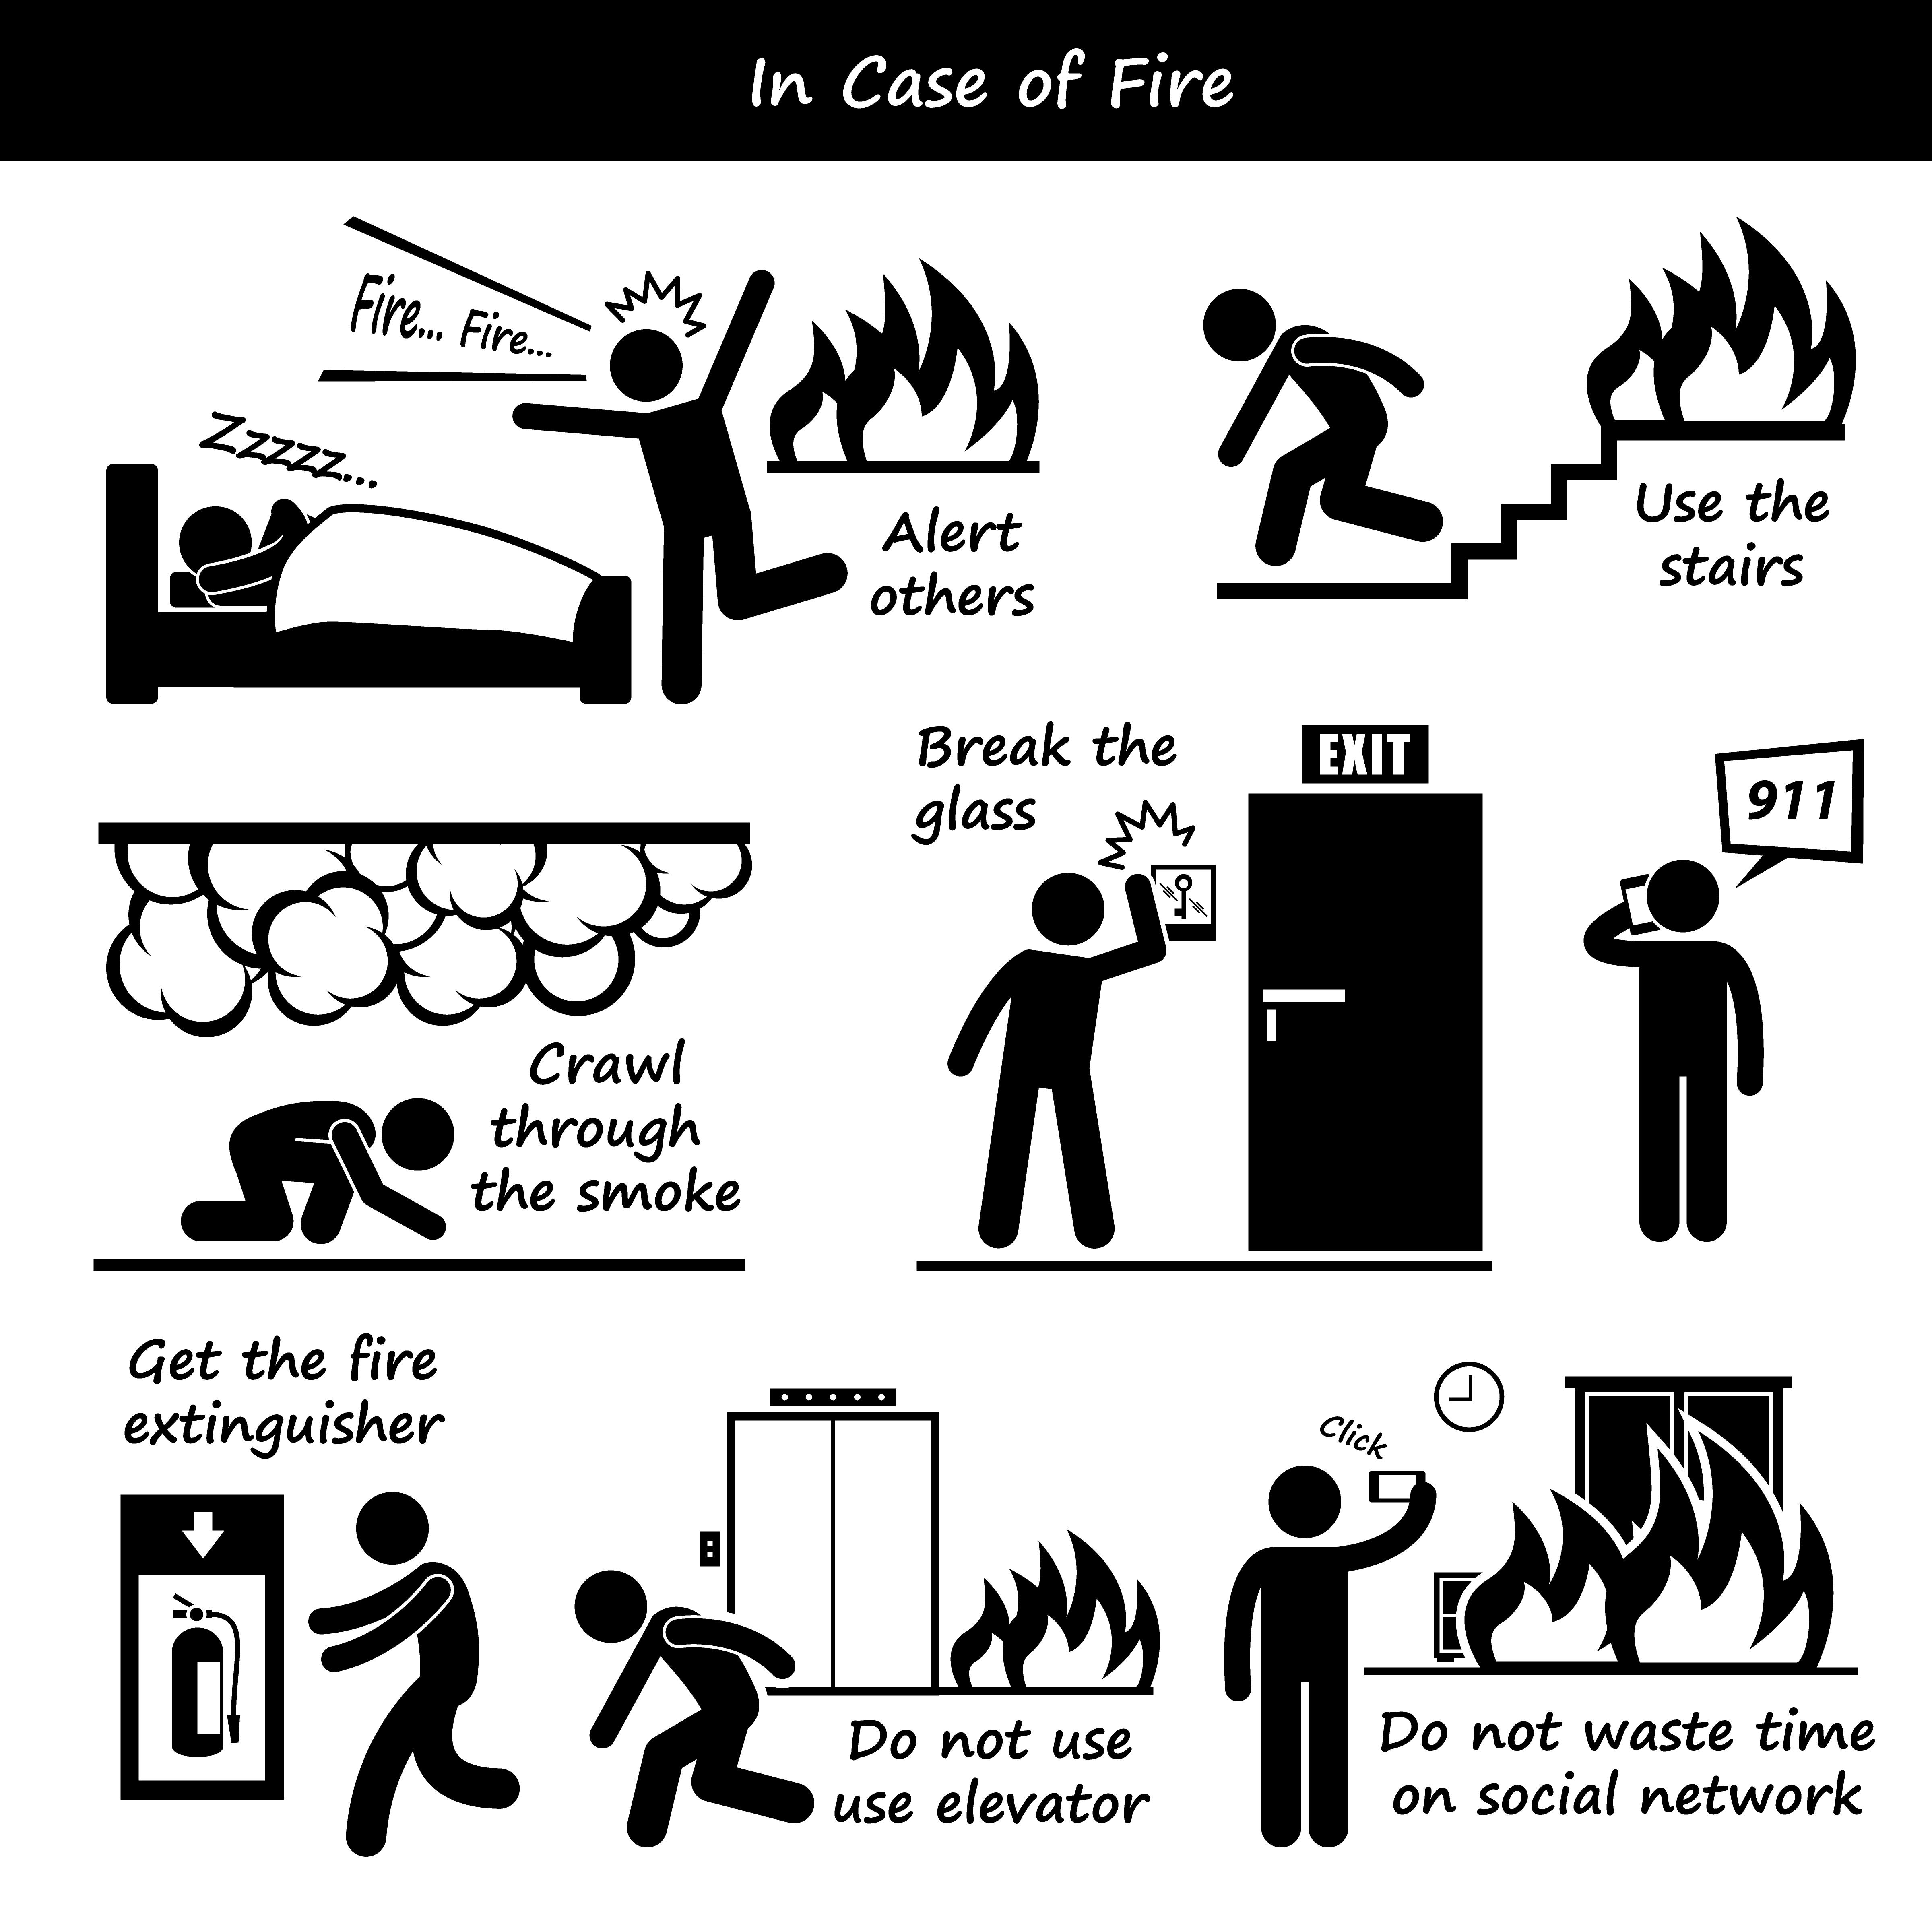 occupant emergency plan template - preparedness is prevention emergency preparedness could